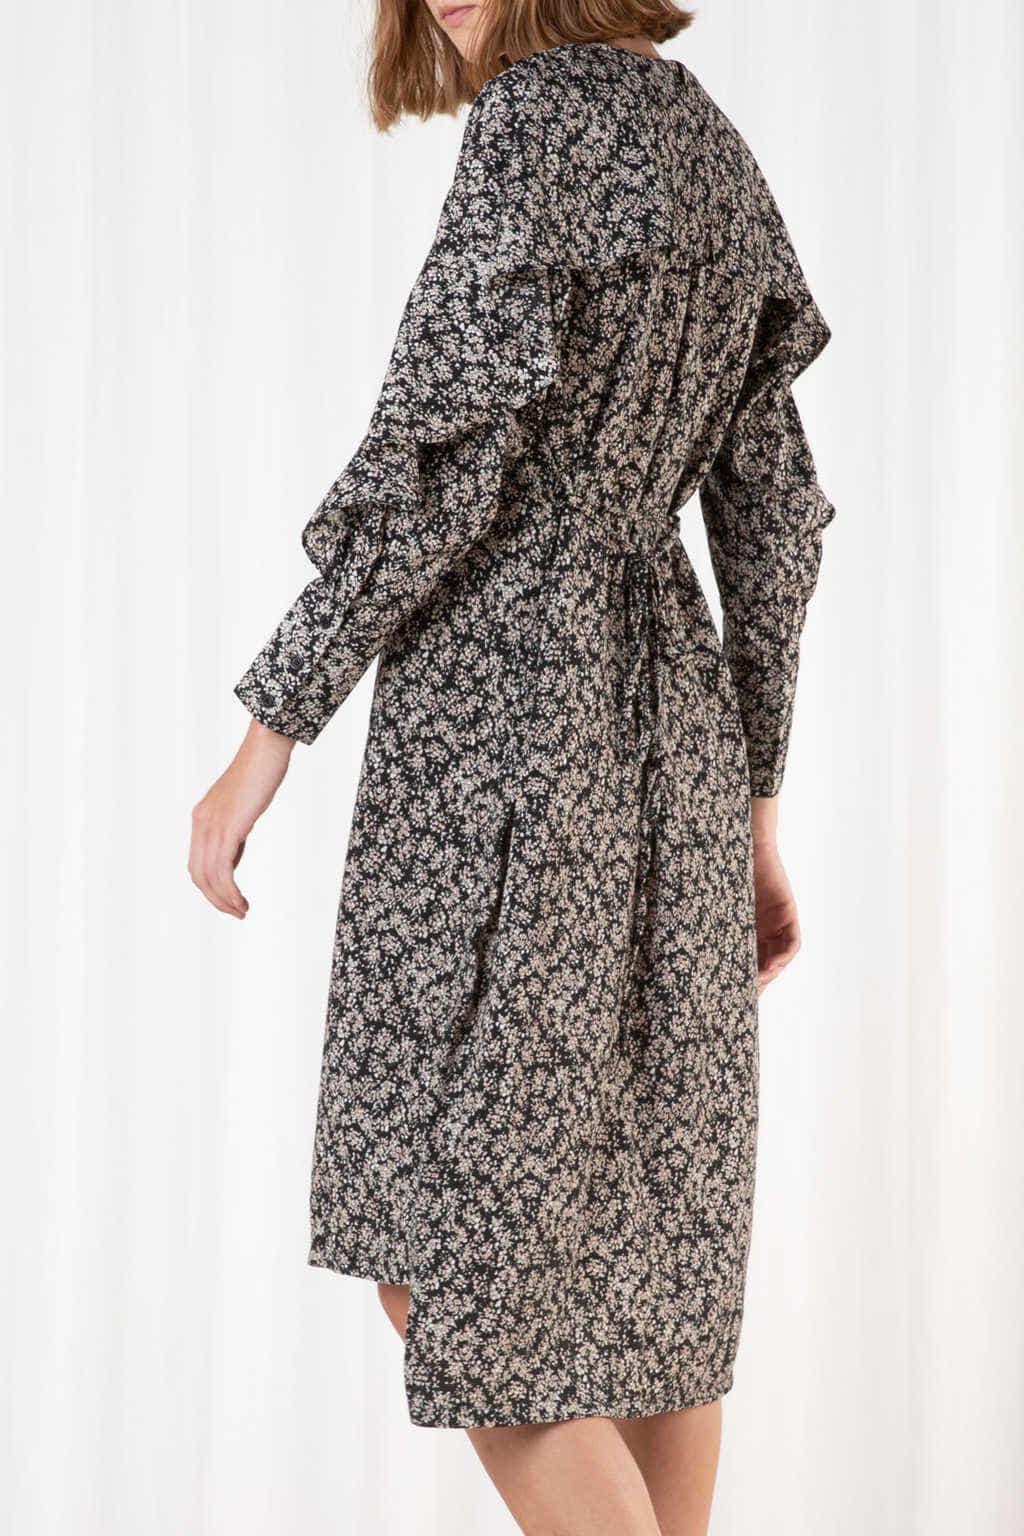 Dress H411 Black 2